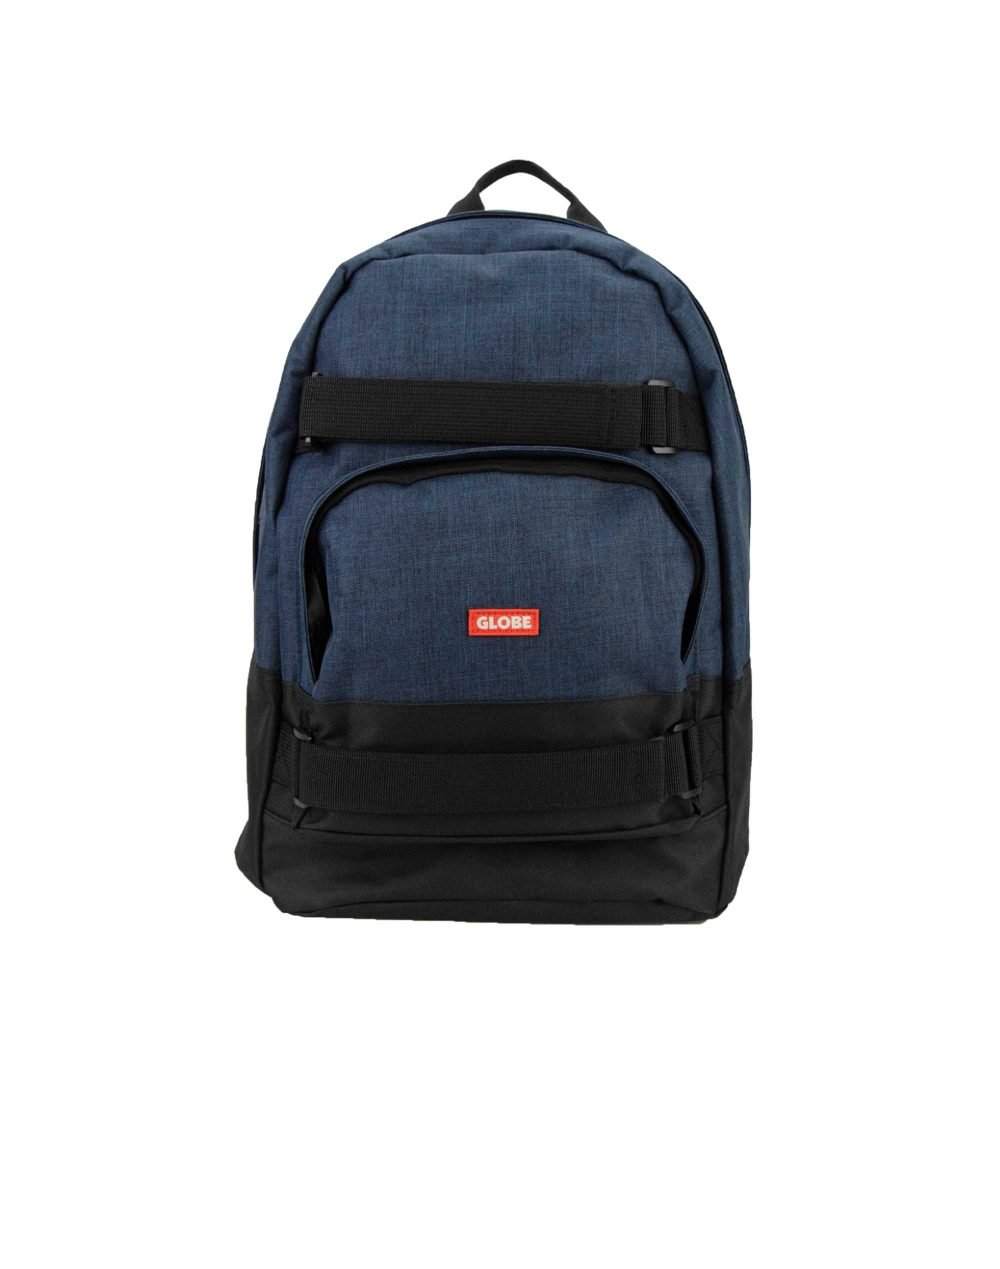 Globe Thurston Backpack 24L (GB71739002) Indigo